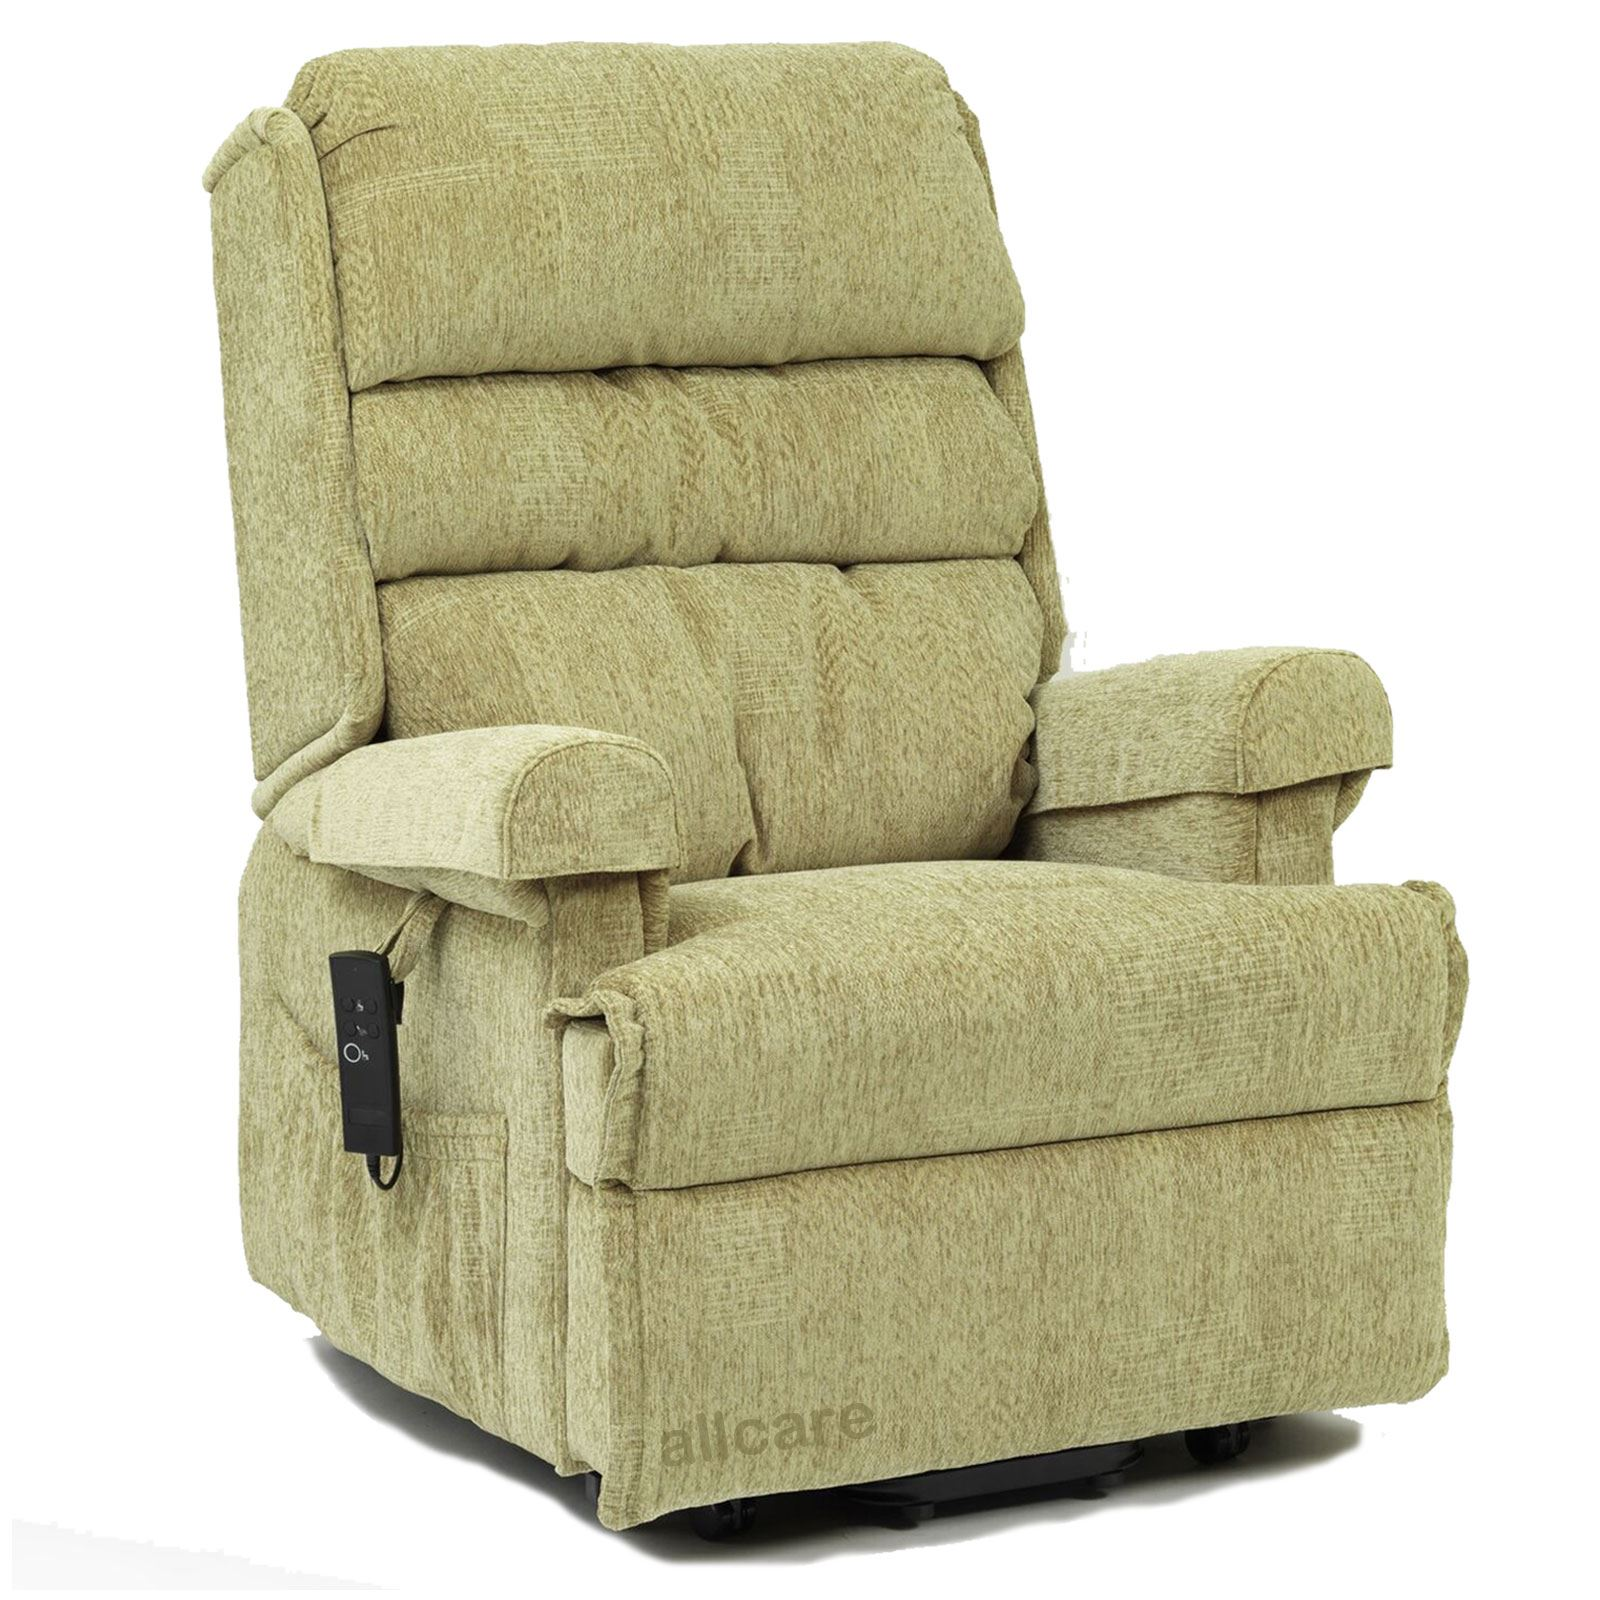 Restwell-Baltimore-Fabric-Electric-Riser-Recliner-Chair-Dual-  sc 1 st  eBay & Restwell Baltimore Fabric Electric Riser Recliner Chair Dual Motor ... islam-shia.org